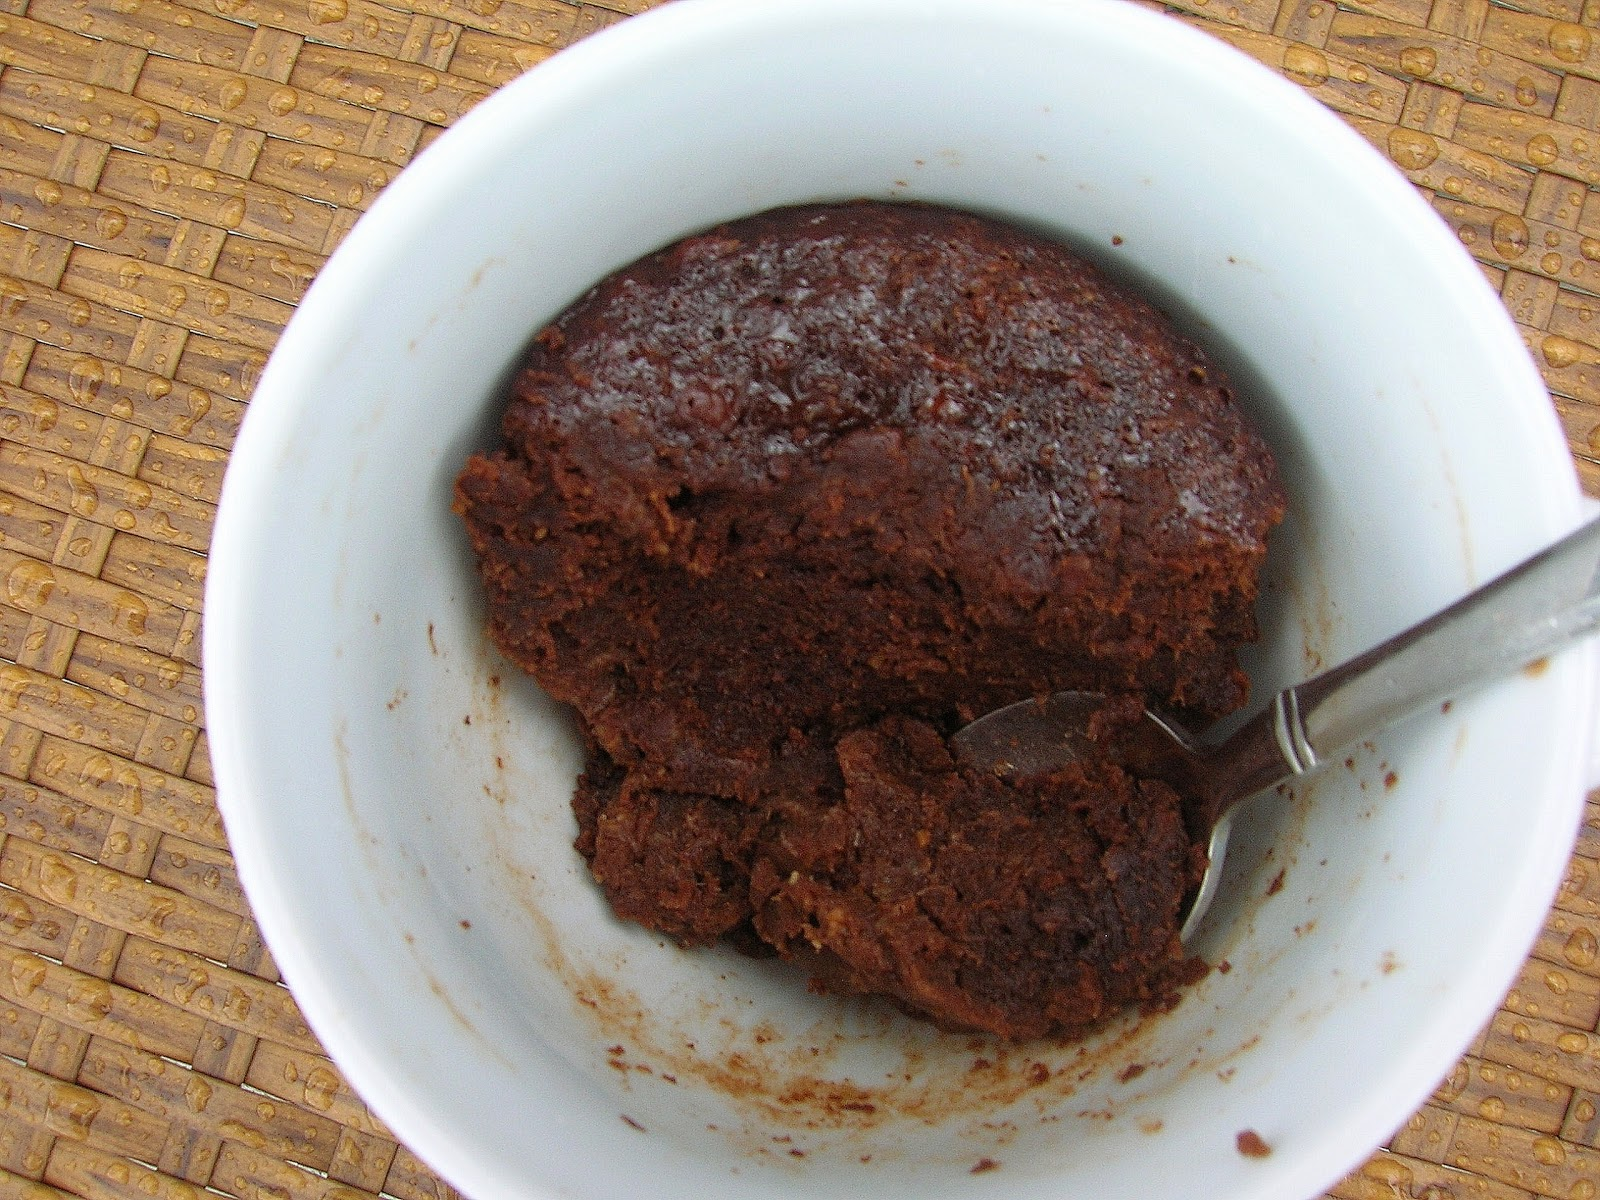 Gluten-Free Chocolate Microwave Cake